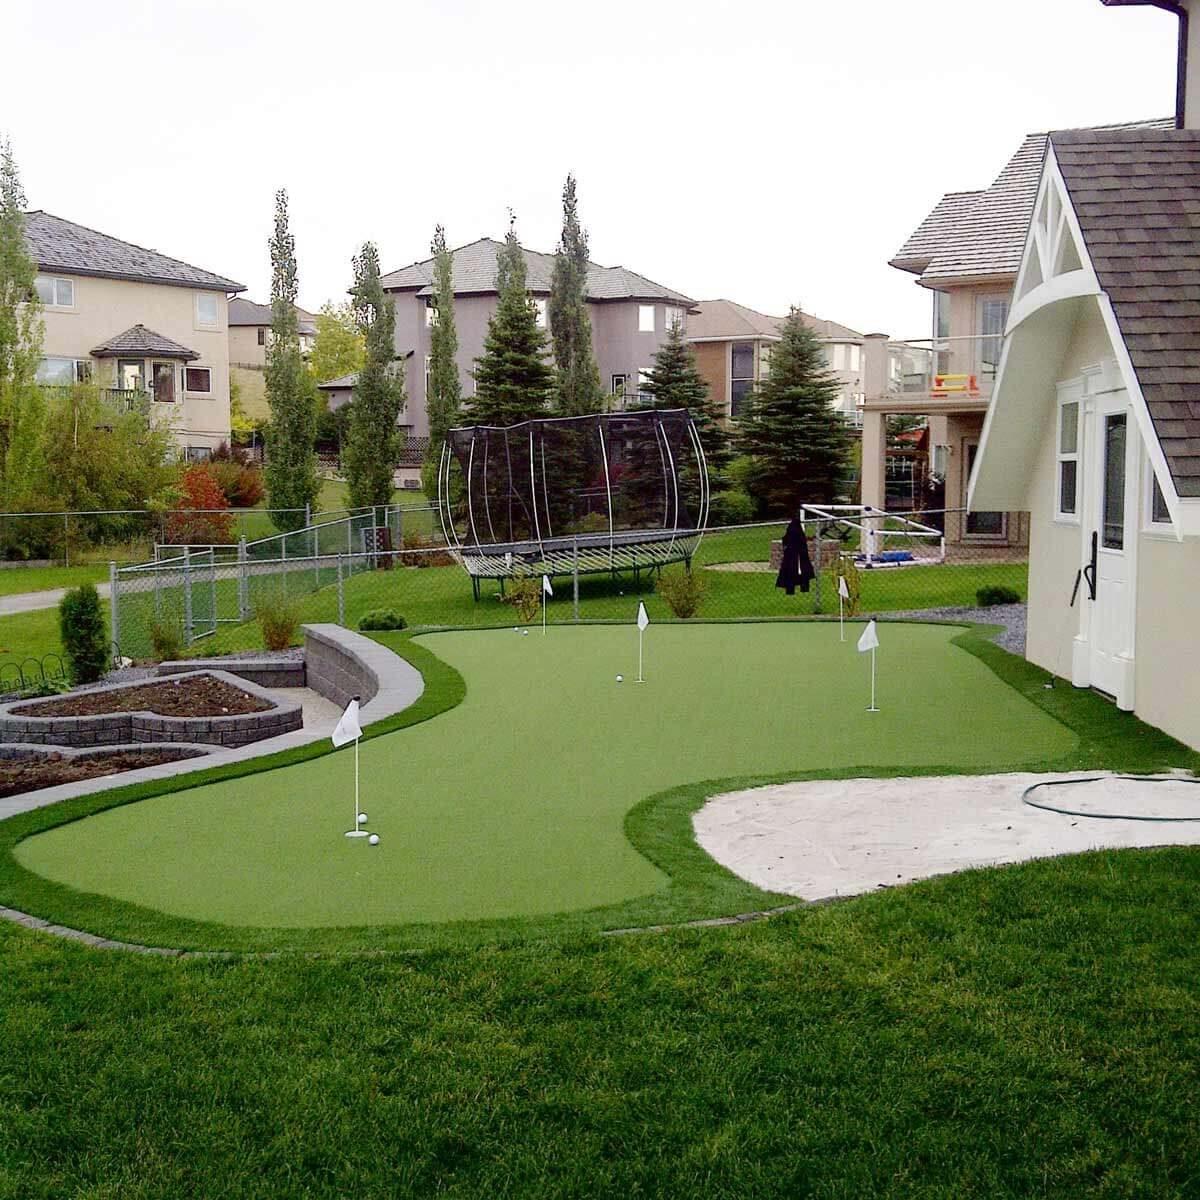 19 Crazy Cool Backyard Putting Greens — The Family Handyman on Putting Green Ideas For Backyard id=48457